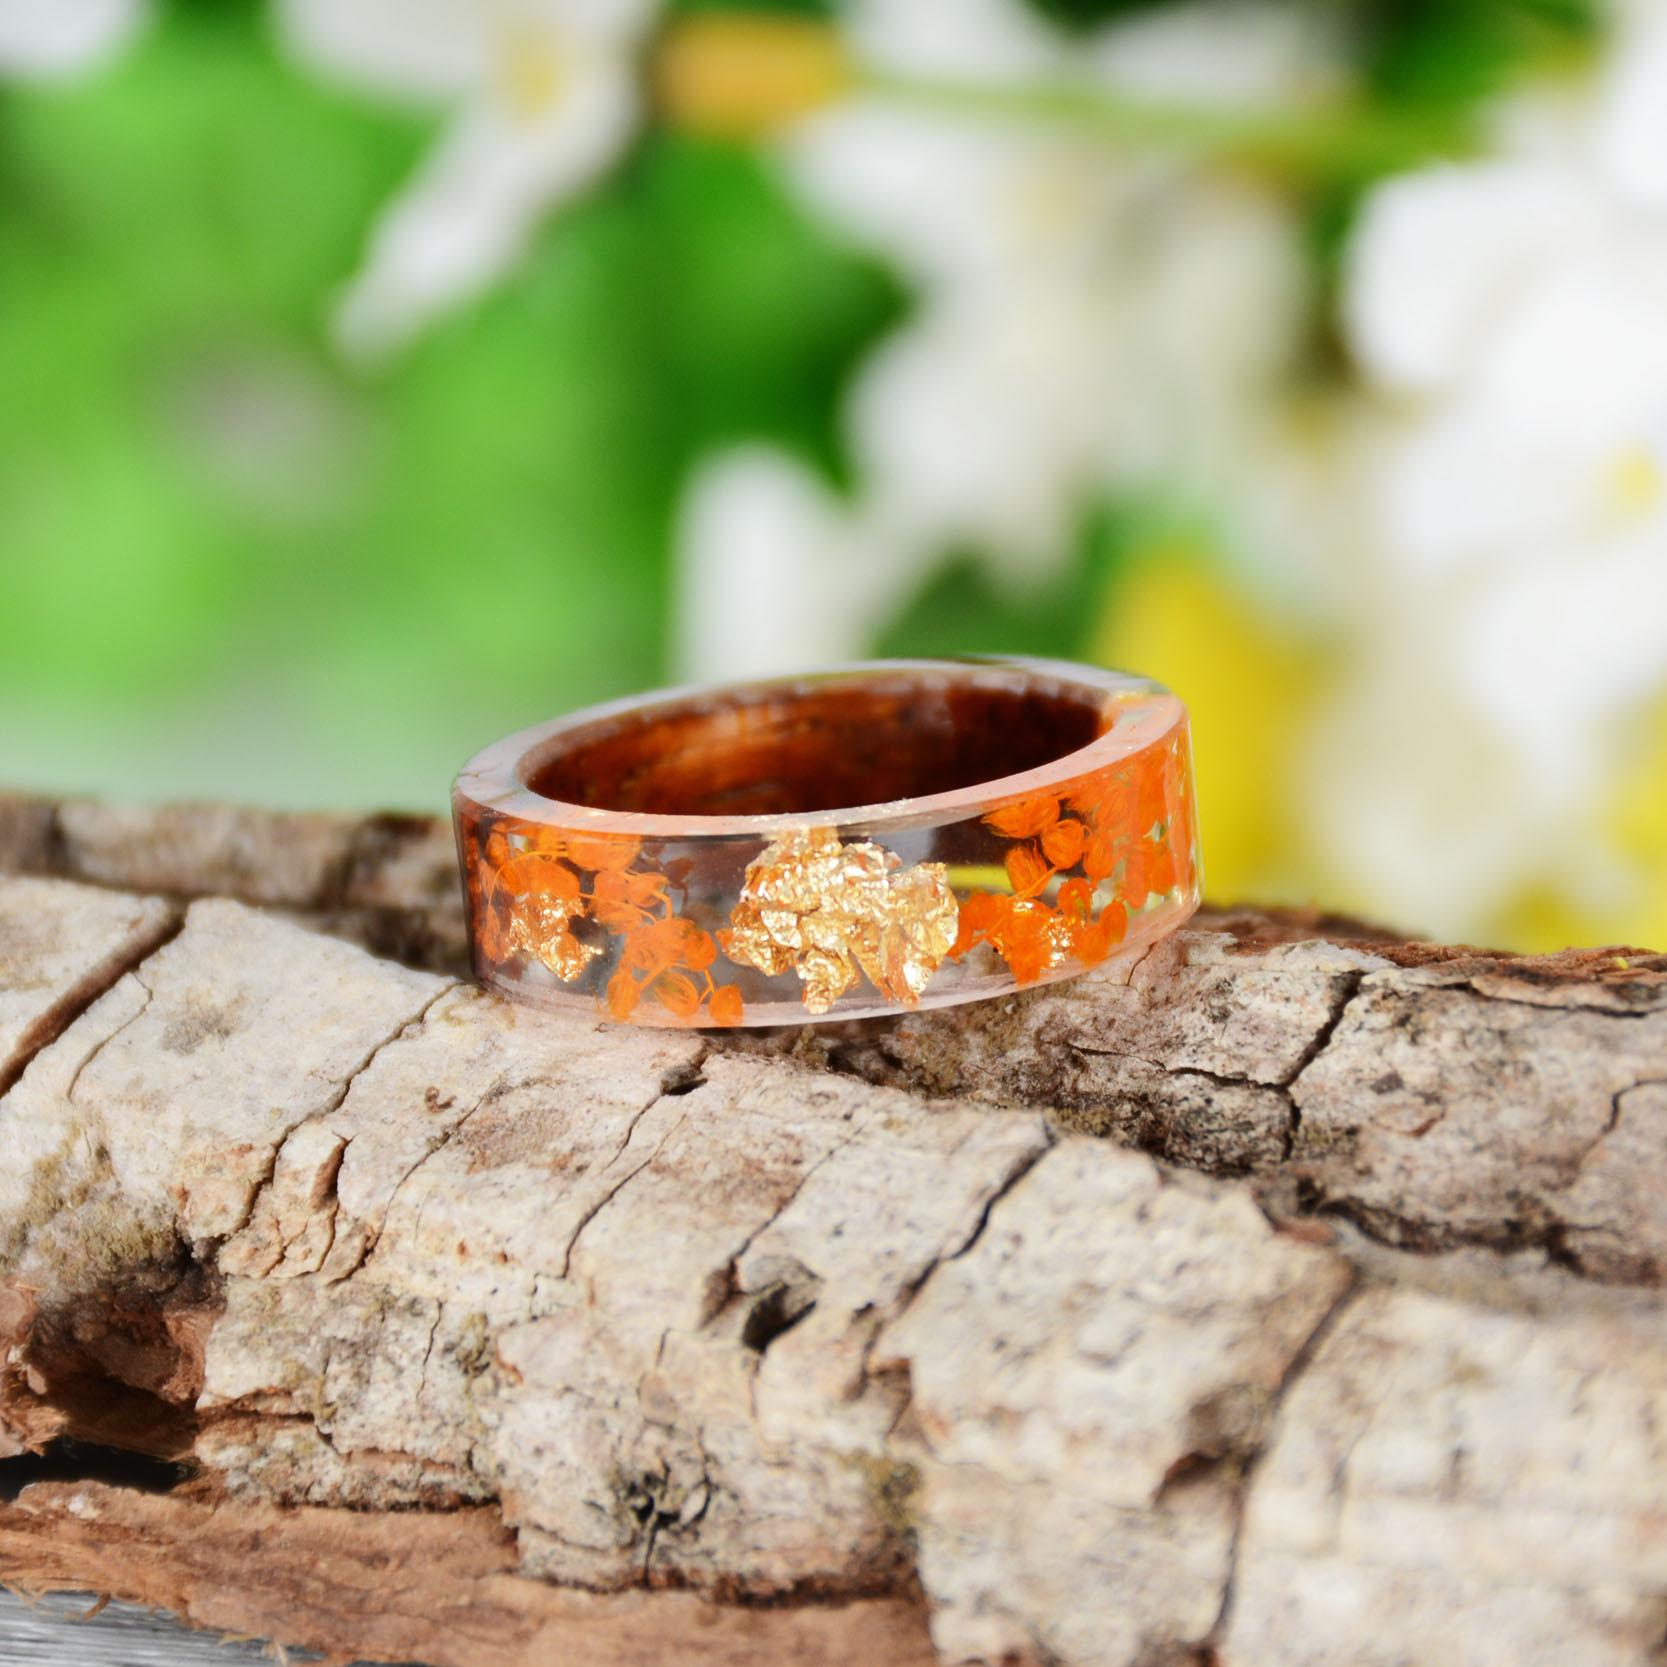 Handmade Wood Resin Ring Many Styles 33